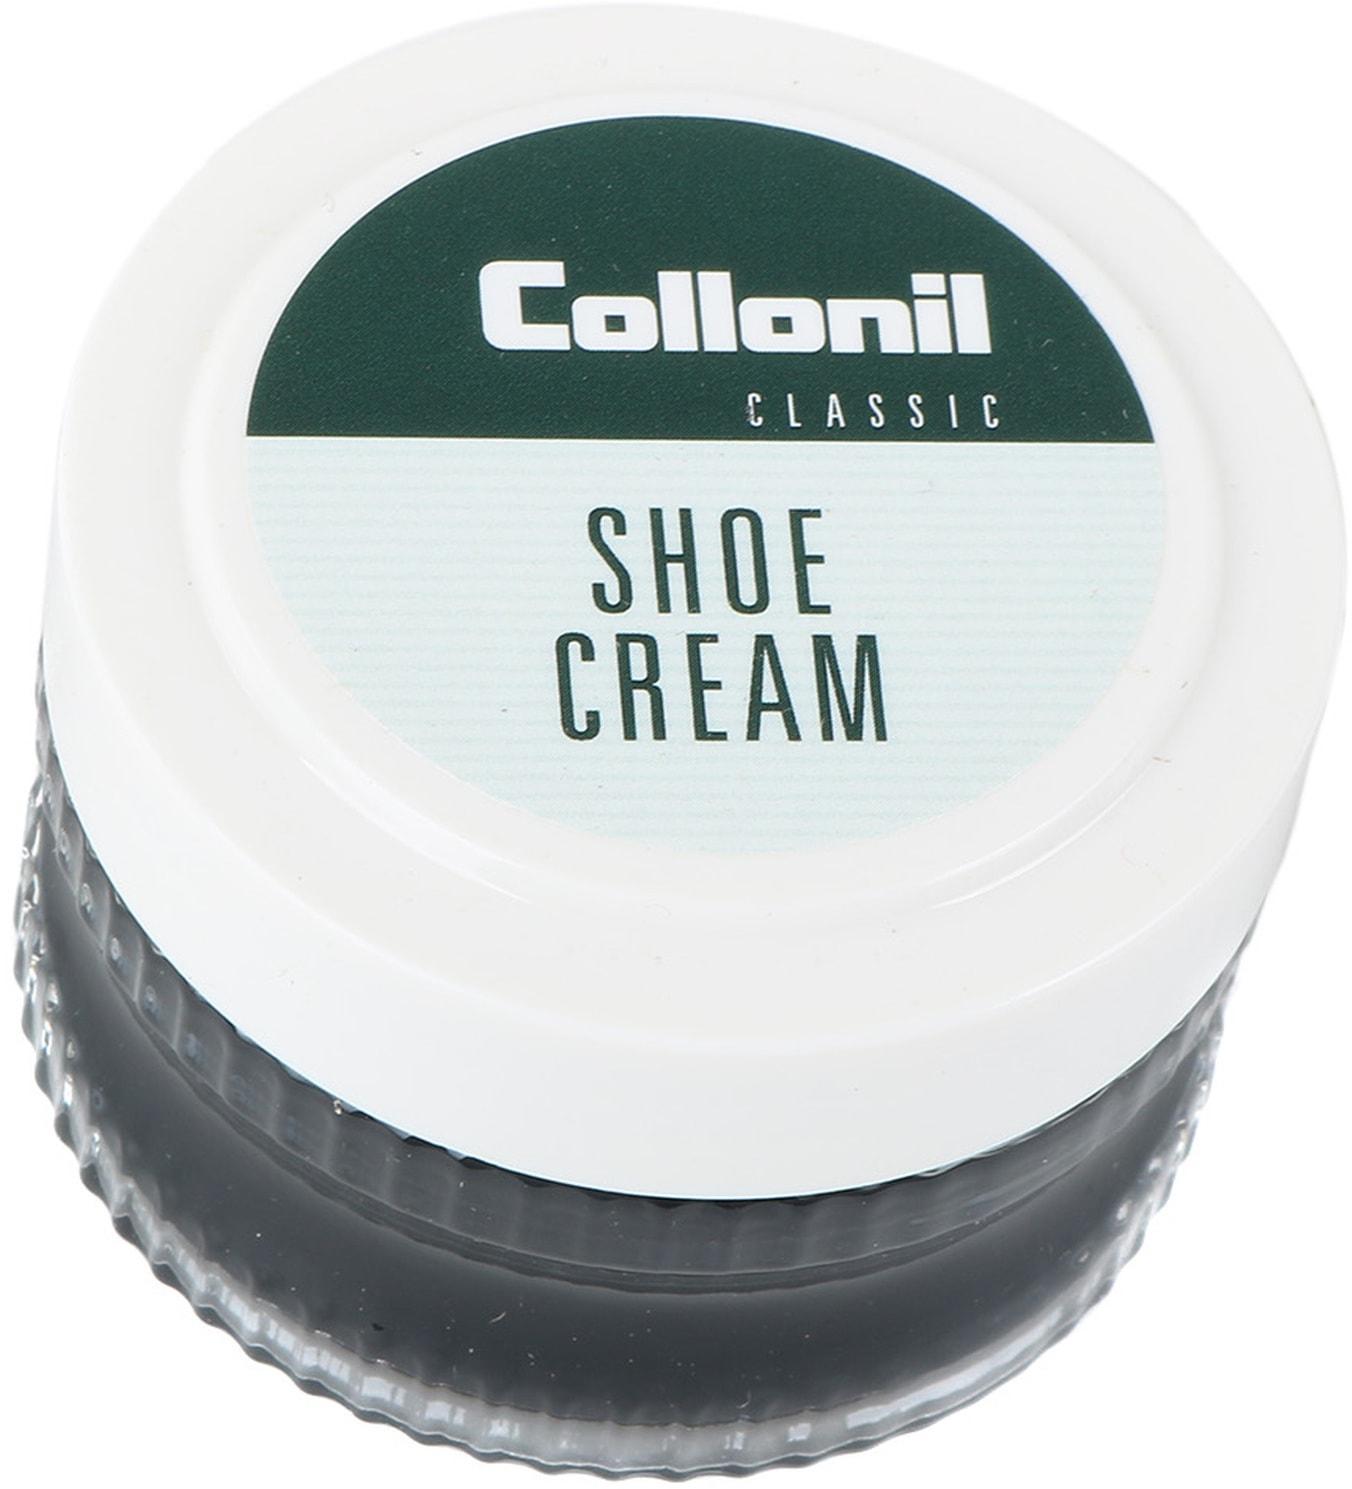 Collonil Shoe Cream Zwart foto 0